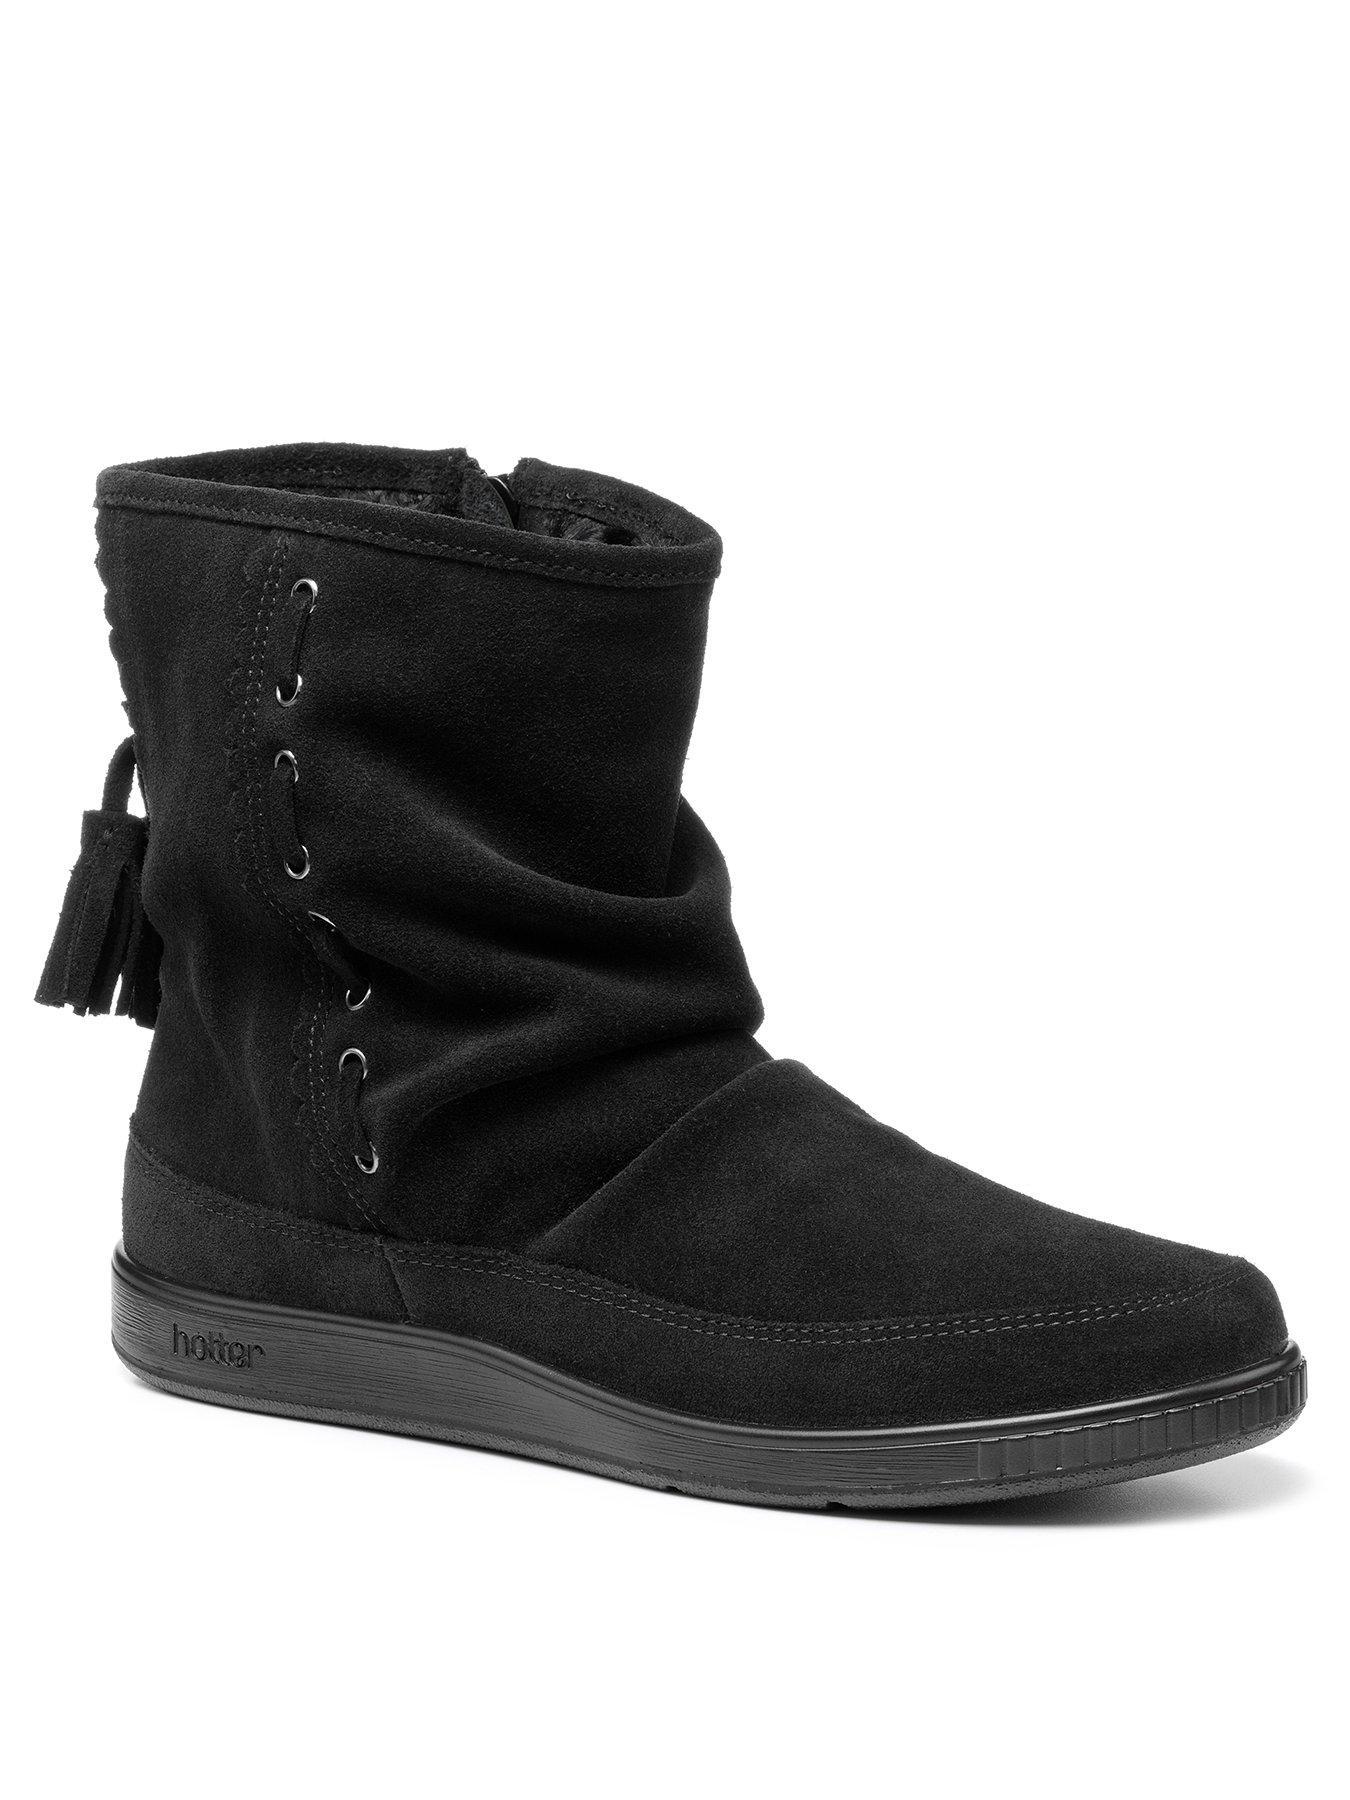 Black   Hotter   Shoes \u0026 boots   Women